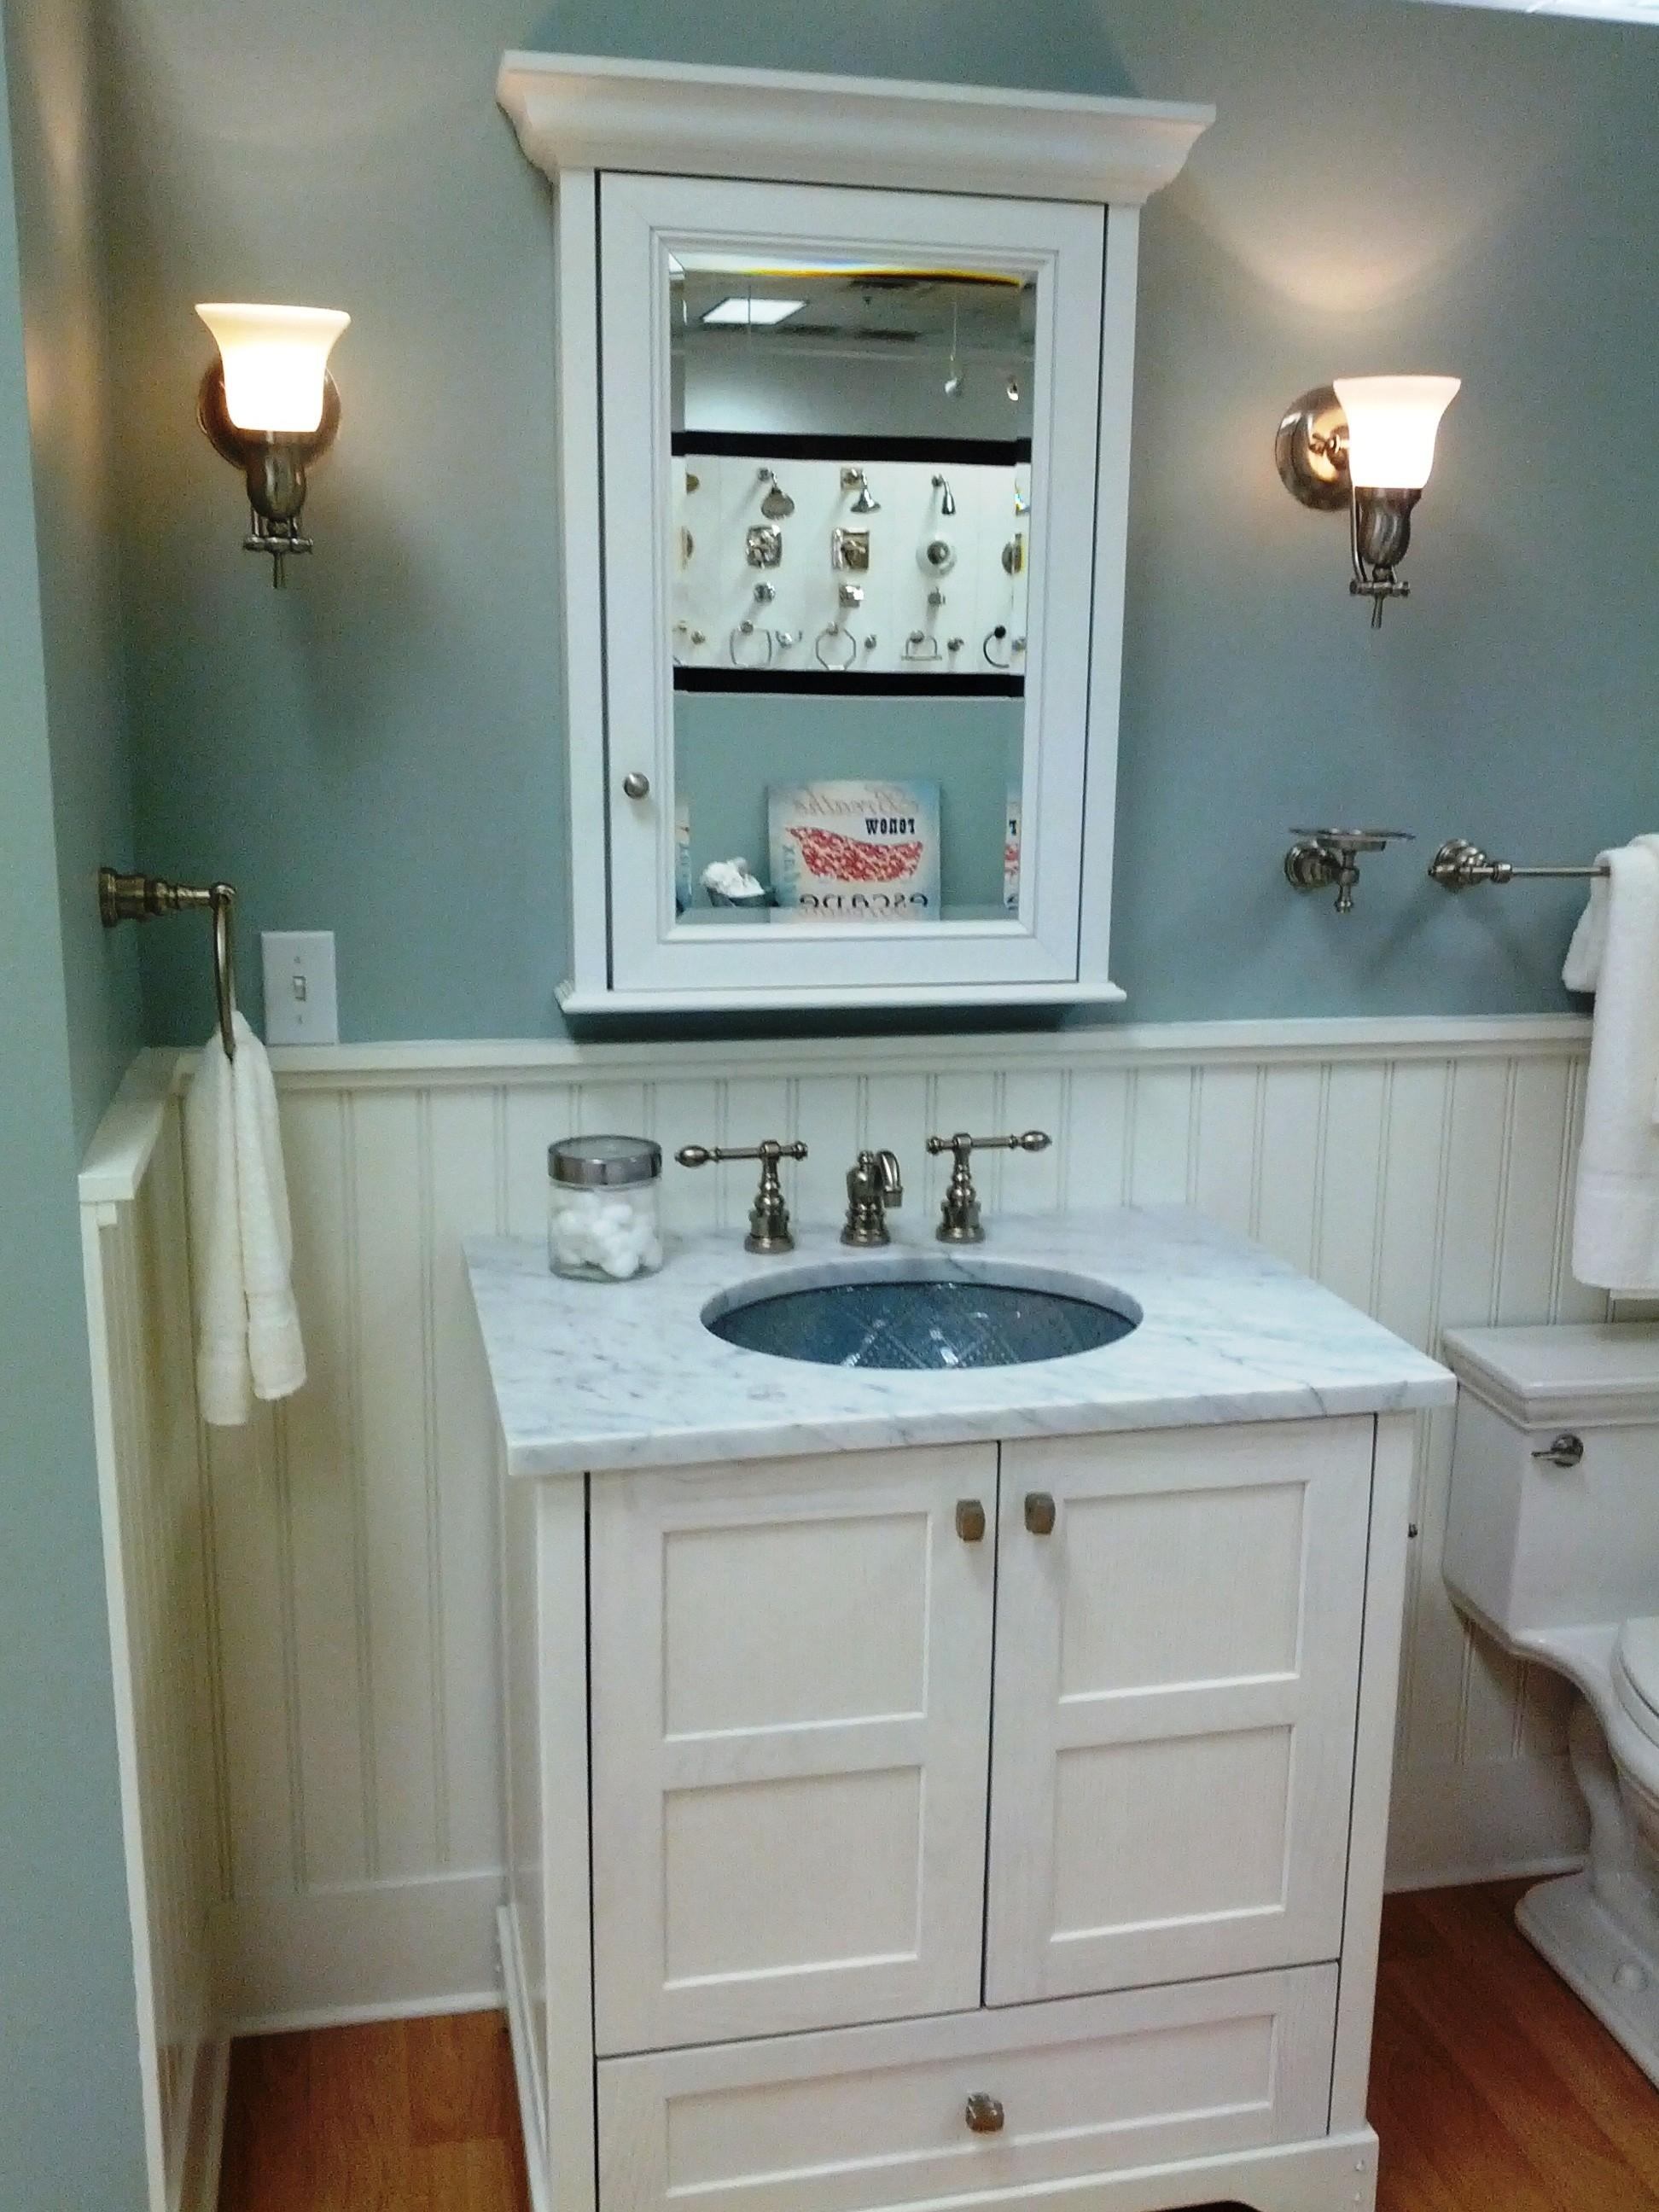 Vintage Bathroom Mirror Ideas Creative Bathroom Decoration Pertaining To Vintage Style Bathroom Mirror (Image 10 of 15)